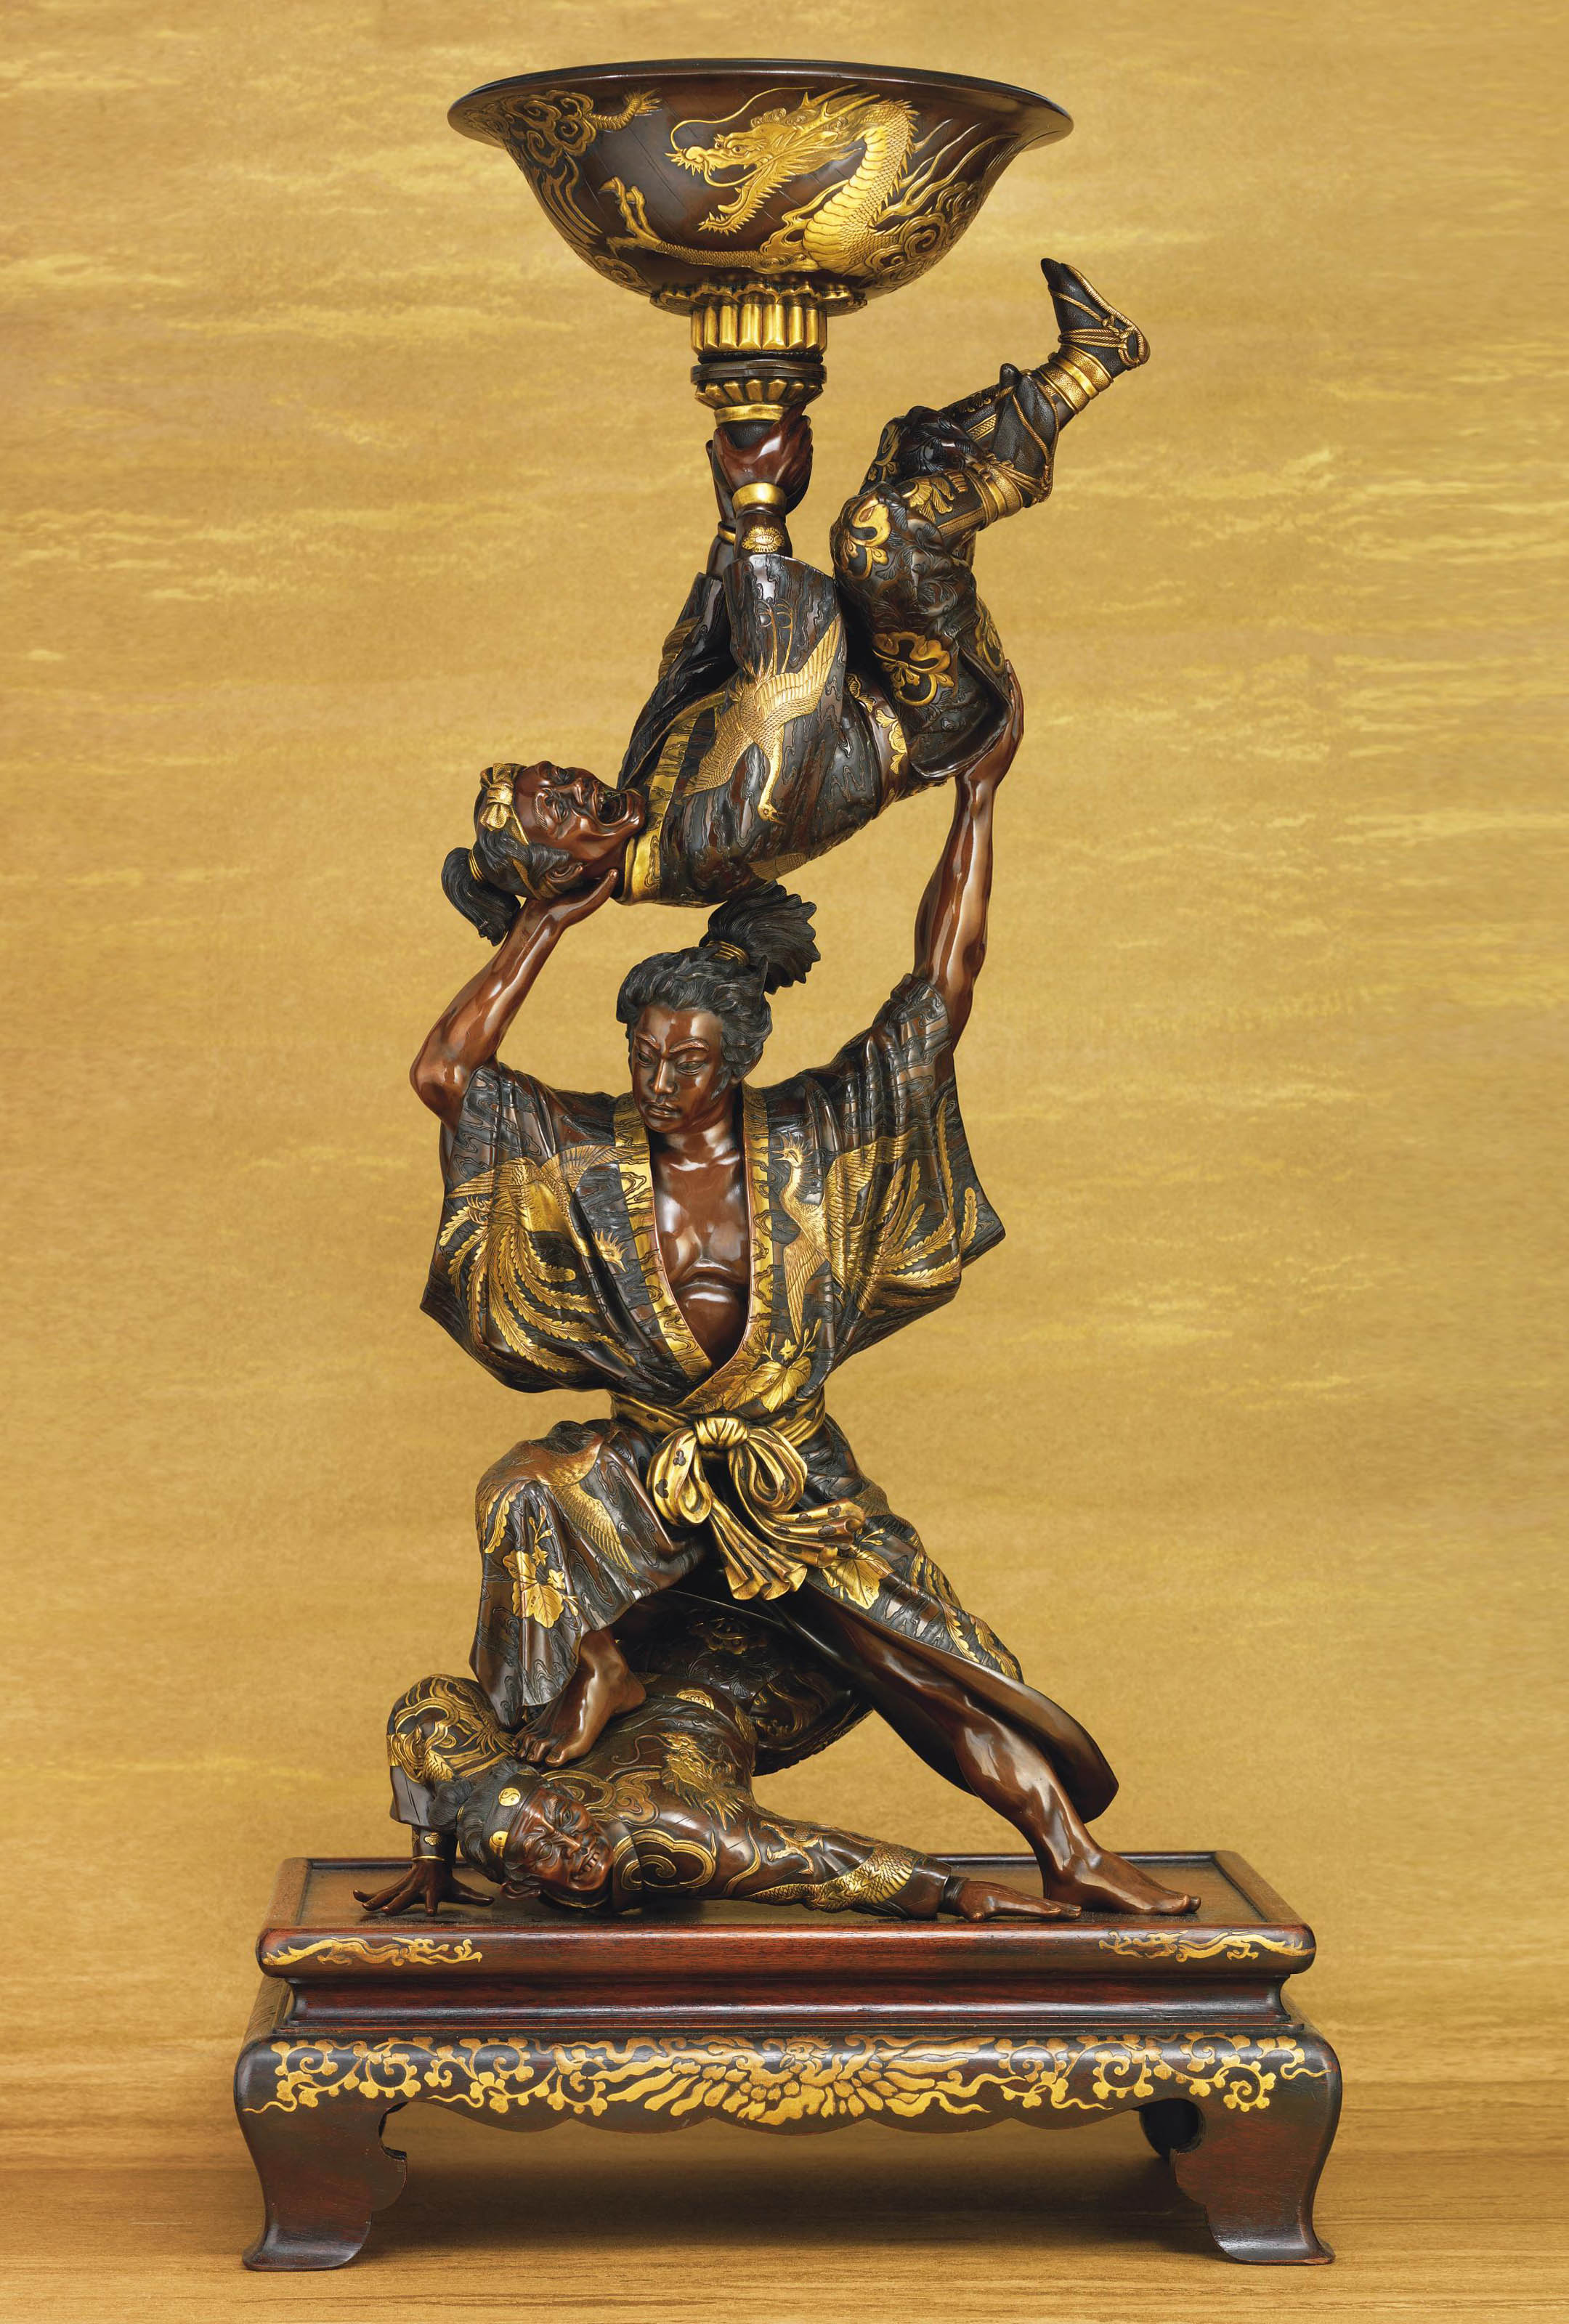 A Magnificent Bronze Sculpture